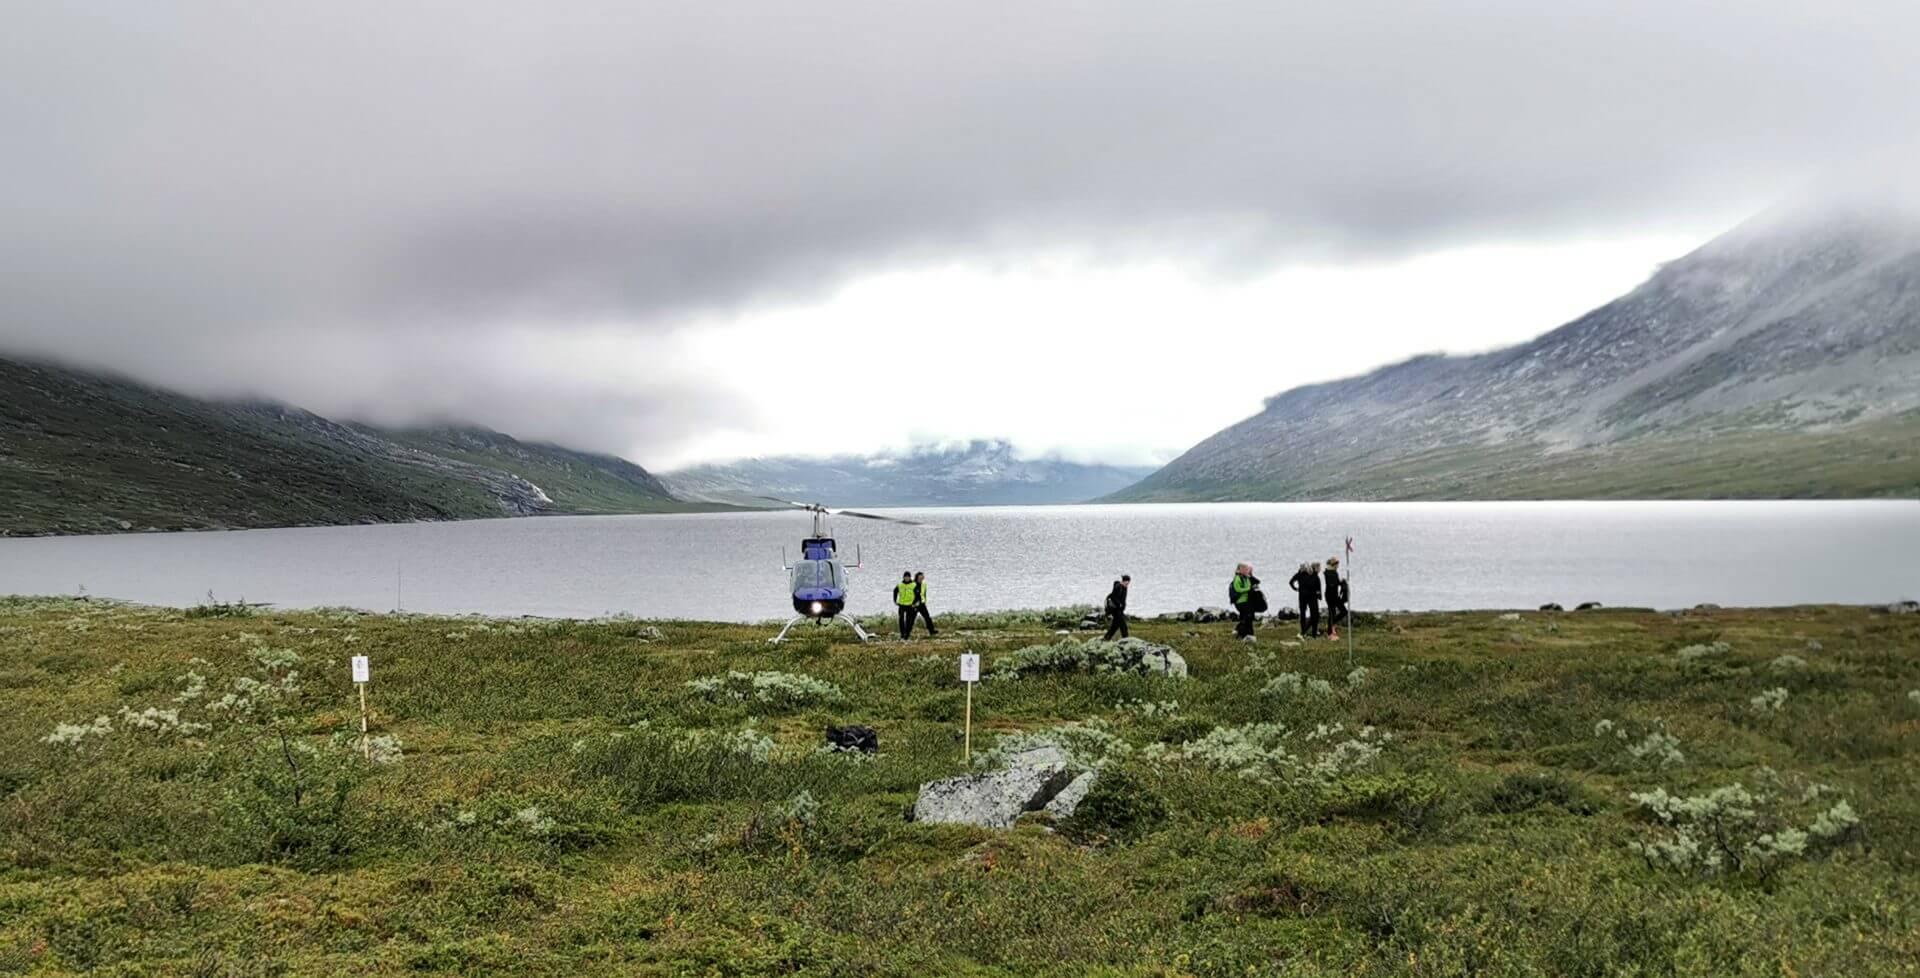 Arctic Circle Race 2019 Polcirkelloppet Guijaure start heli4